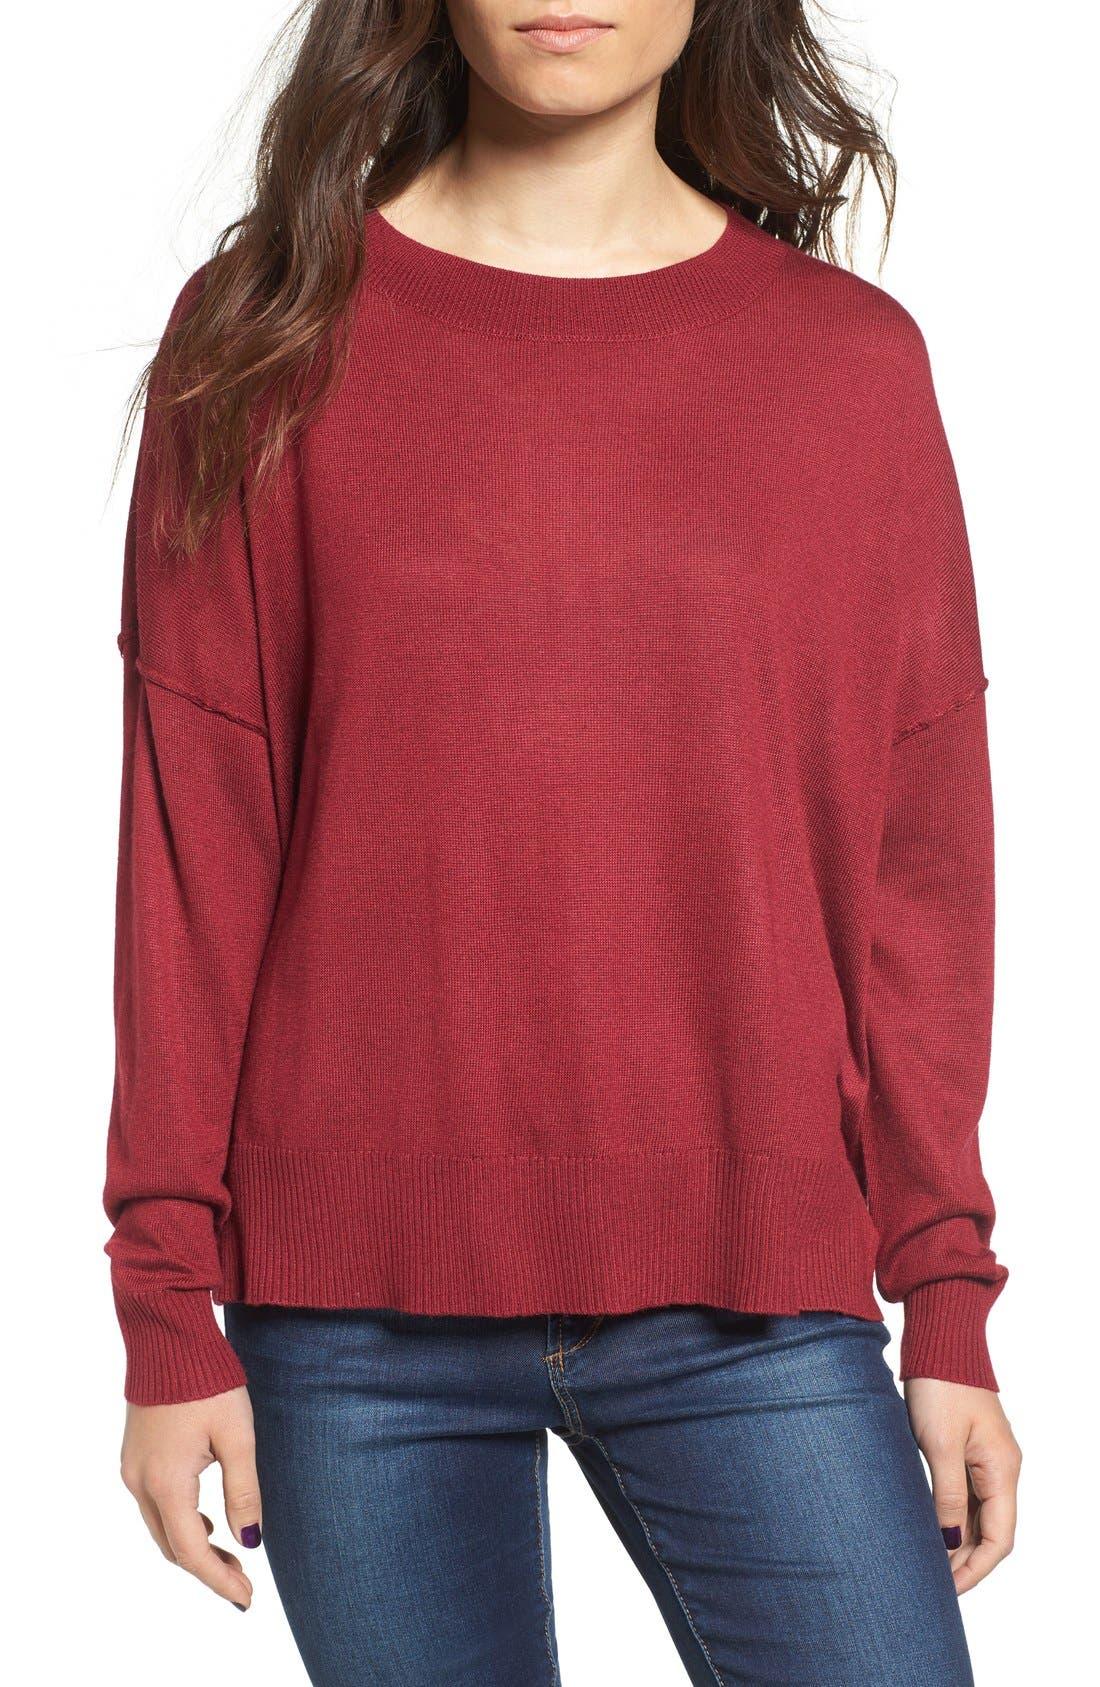 Alternate Image 1 Selected - BP. Drop Shoulder Pullover Sweater